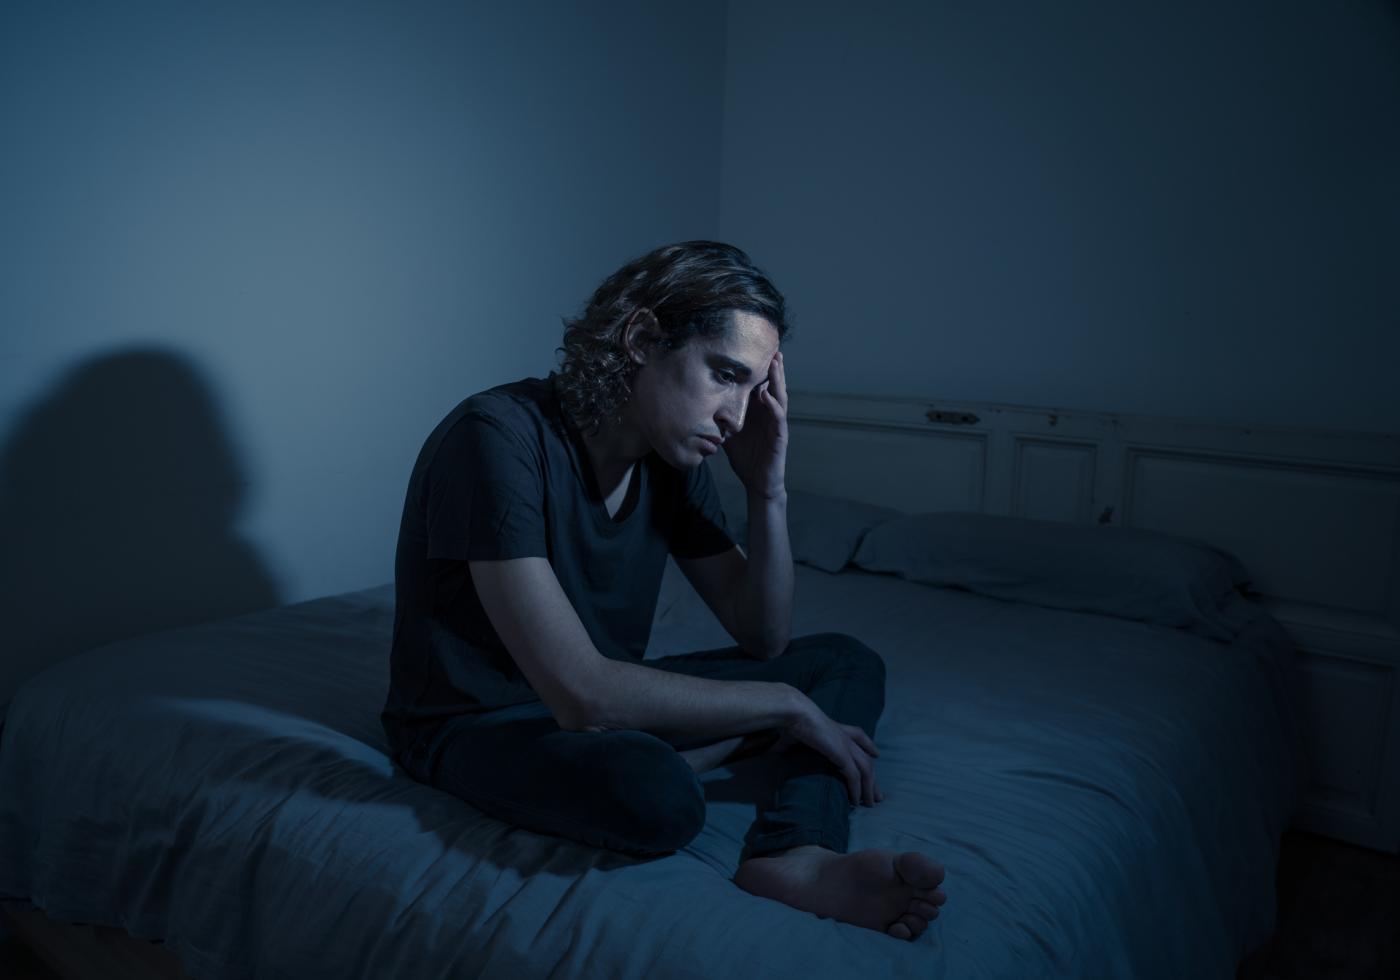 Depressed man sitting on his bed